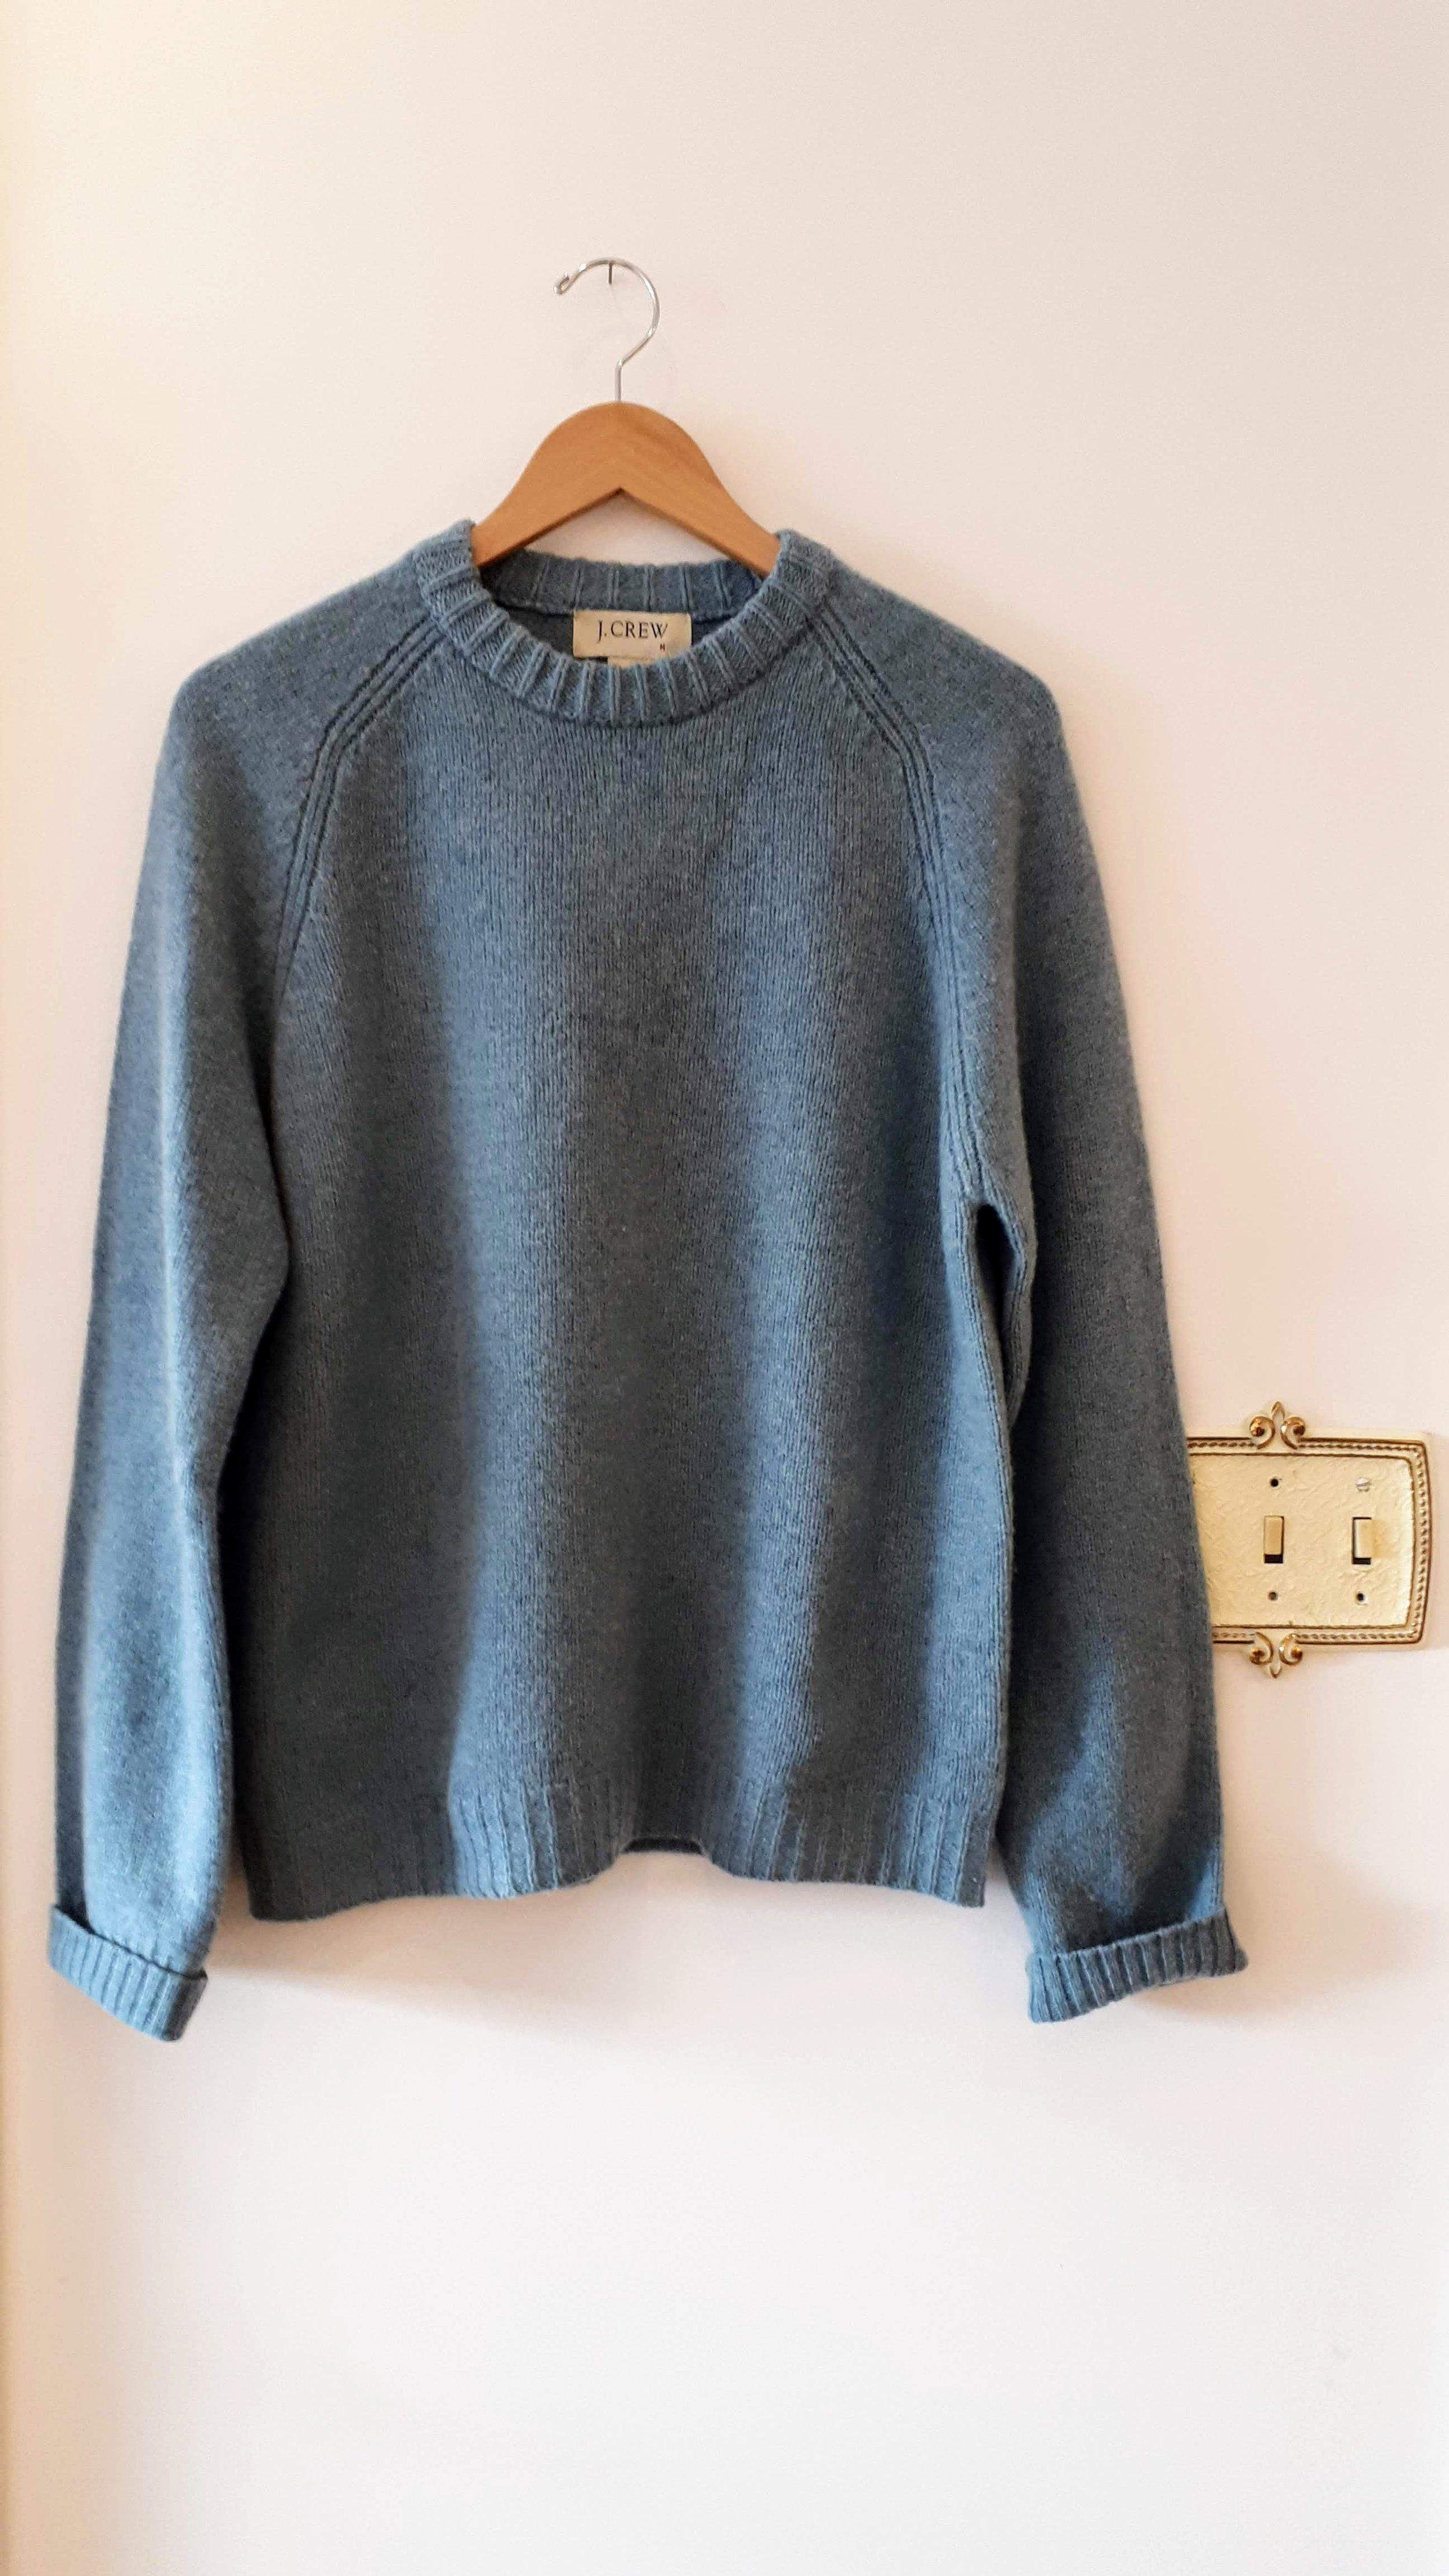 J Crew mens sweater (NWT); Size M, $42